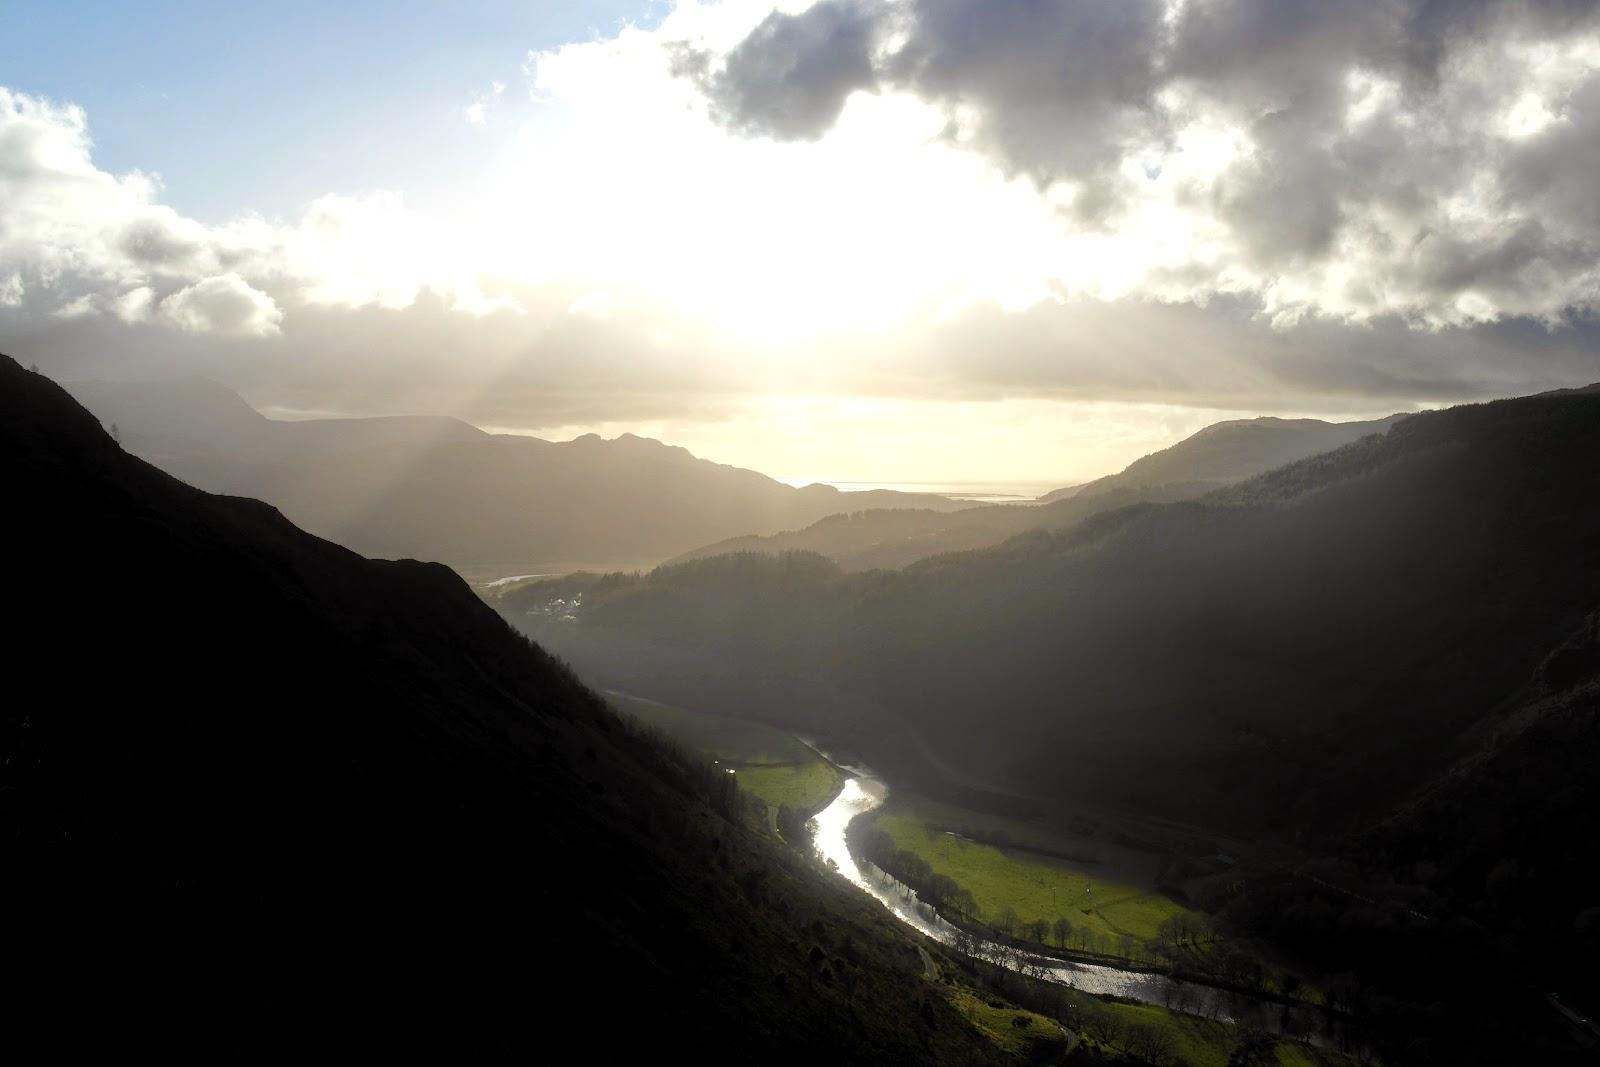 Precipice Walk, Snowdonia View of River Mawddach and Estuary